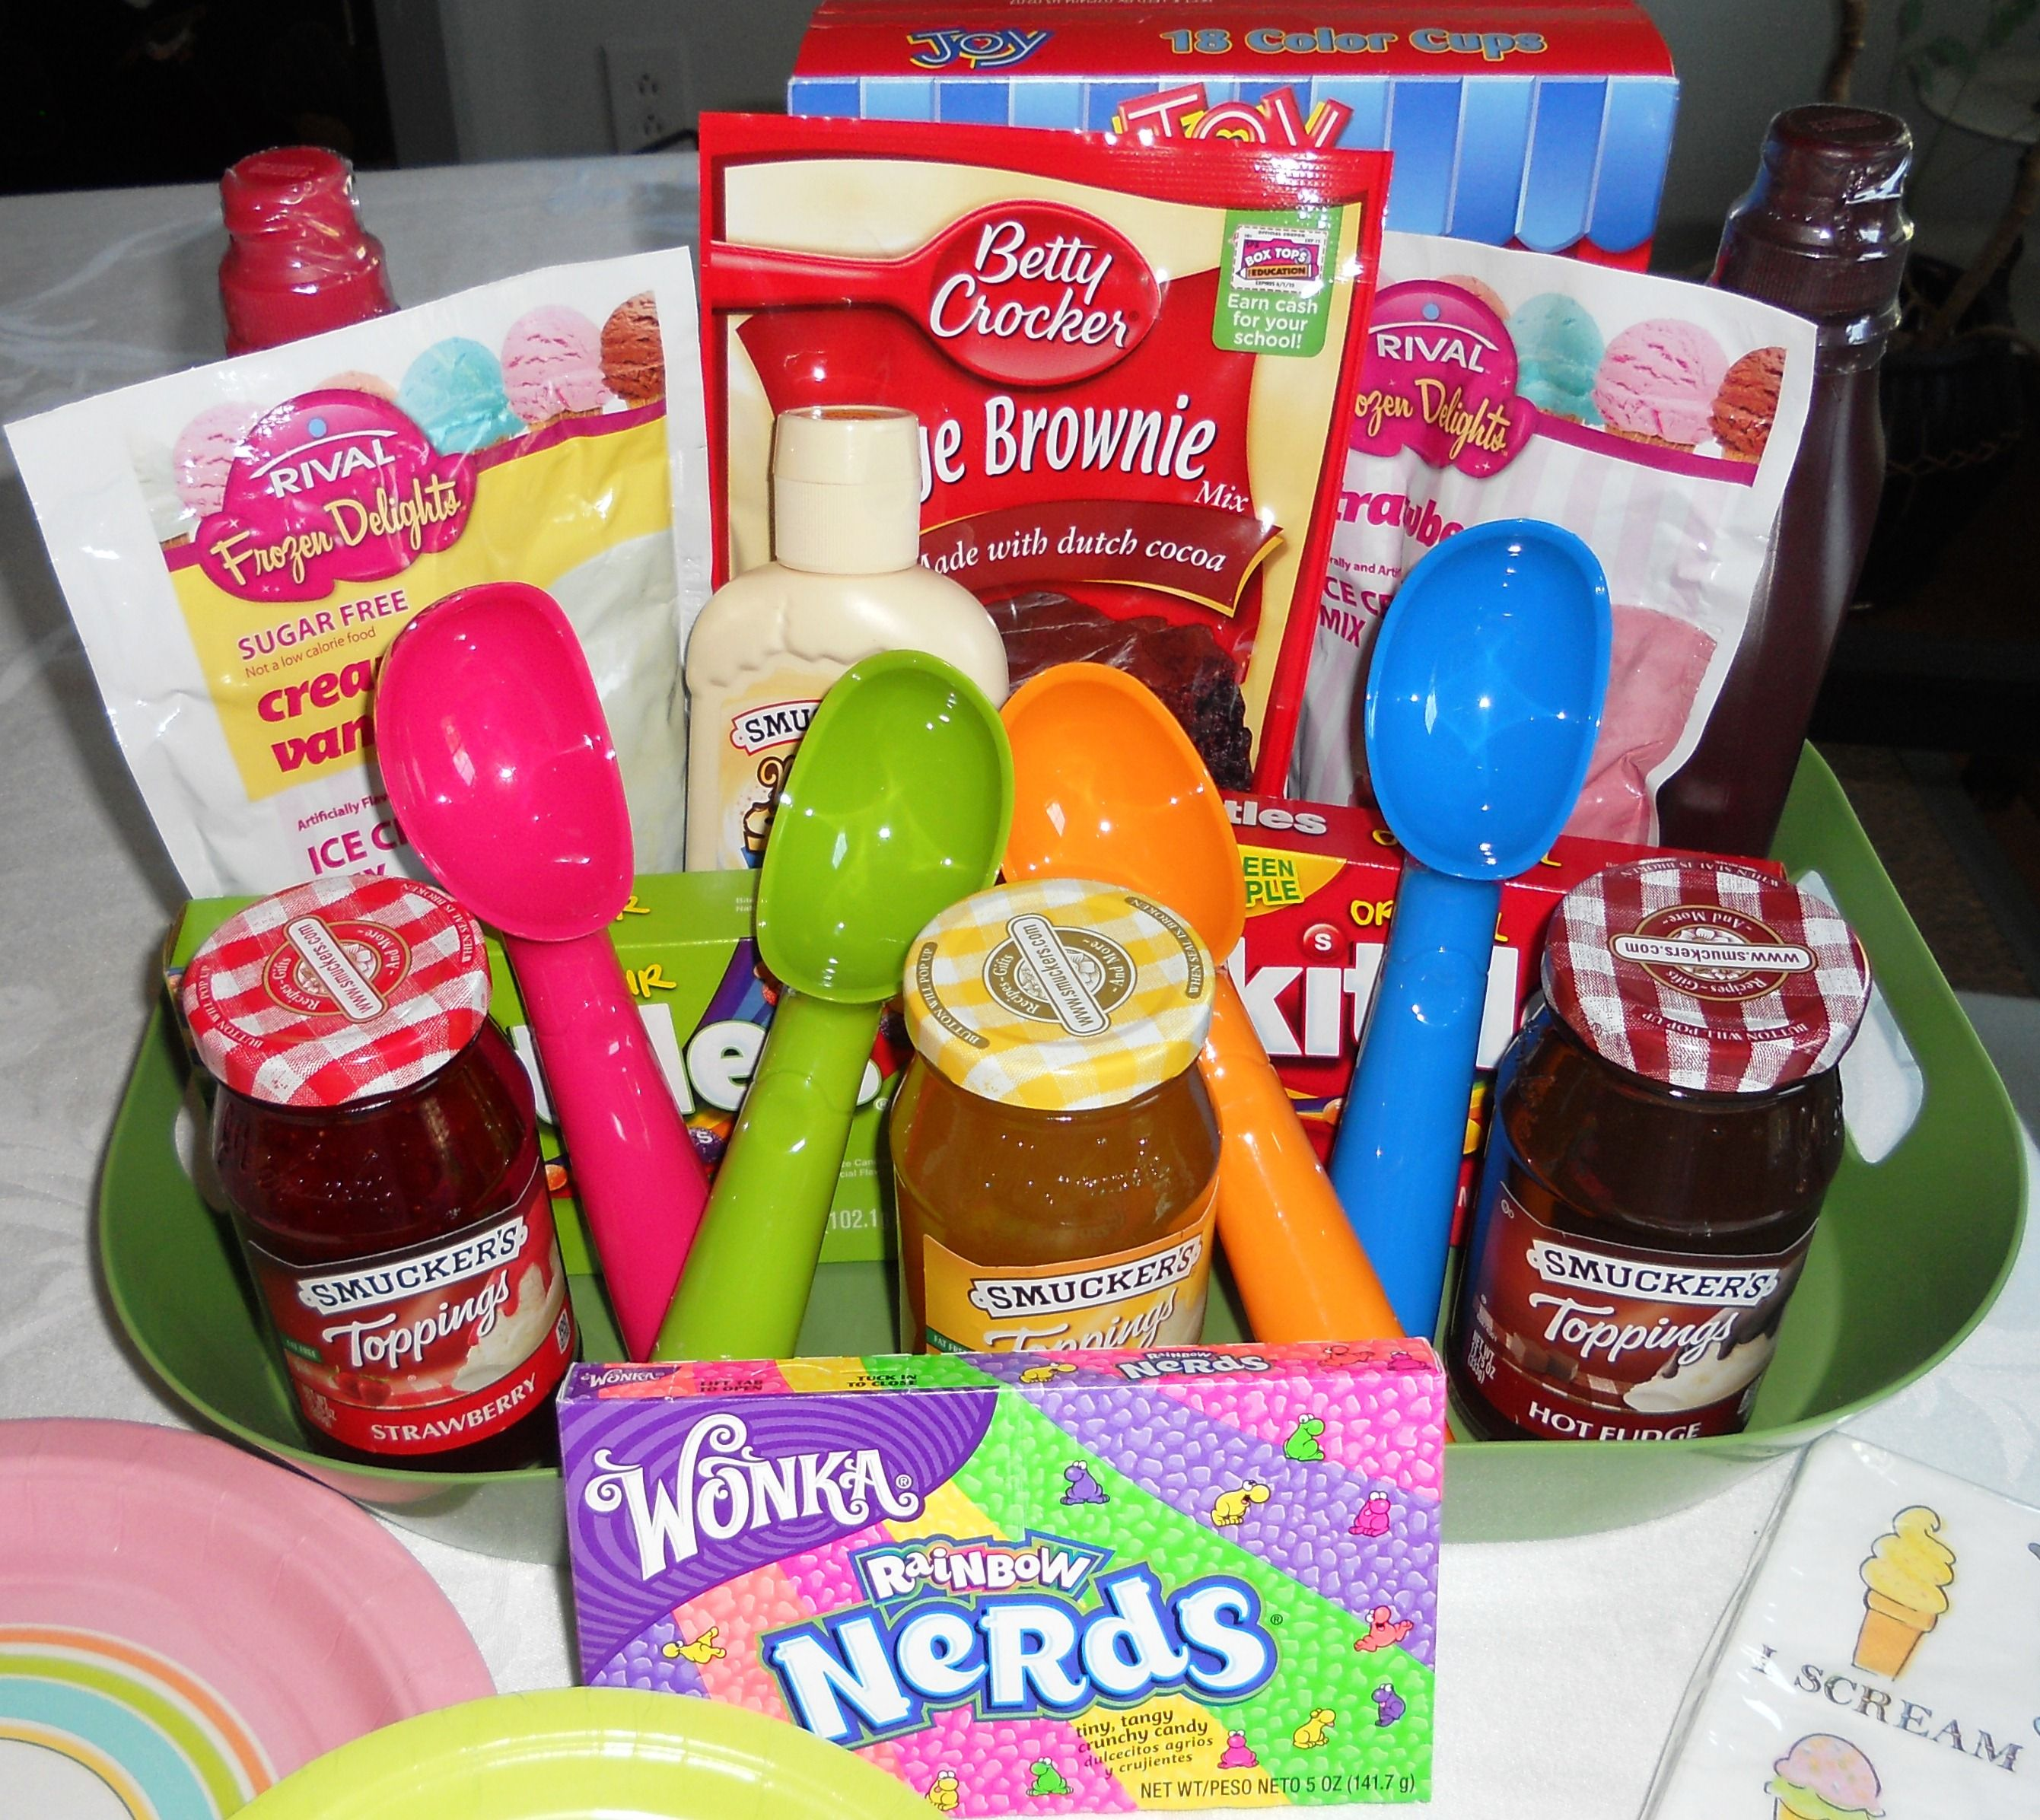 Ice Cream party basket | gift baskets | Pinterest | Basket ideas ...